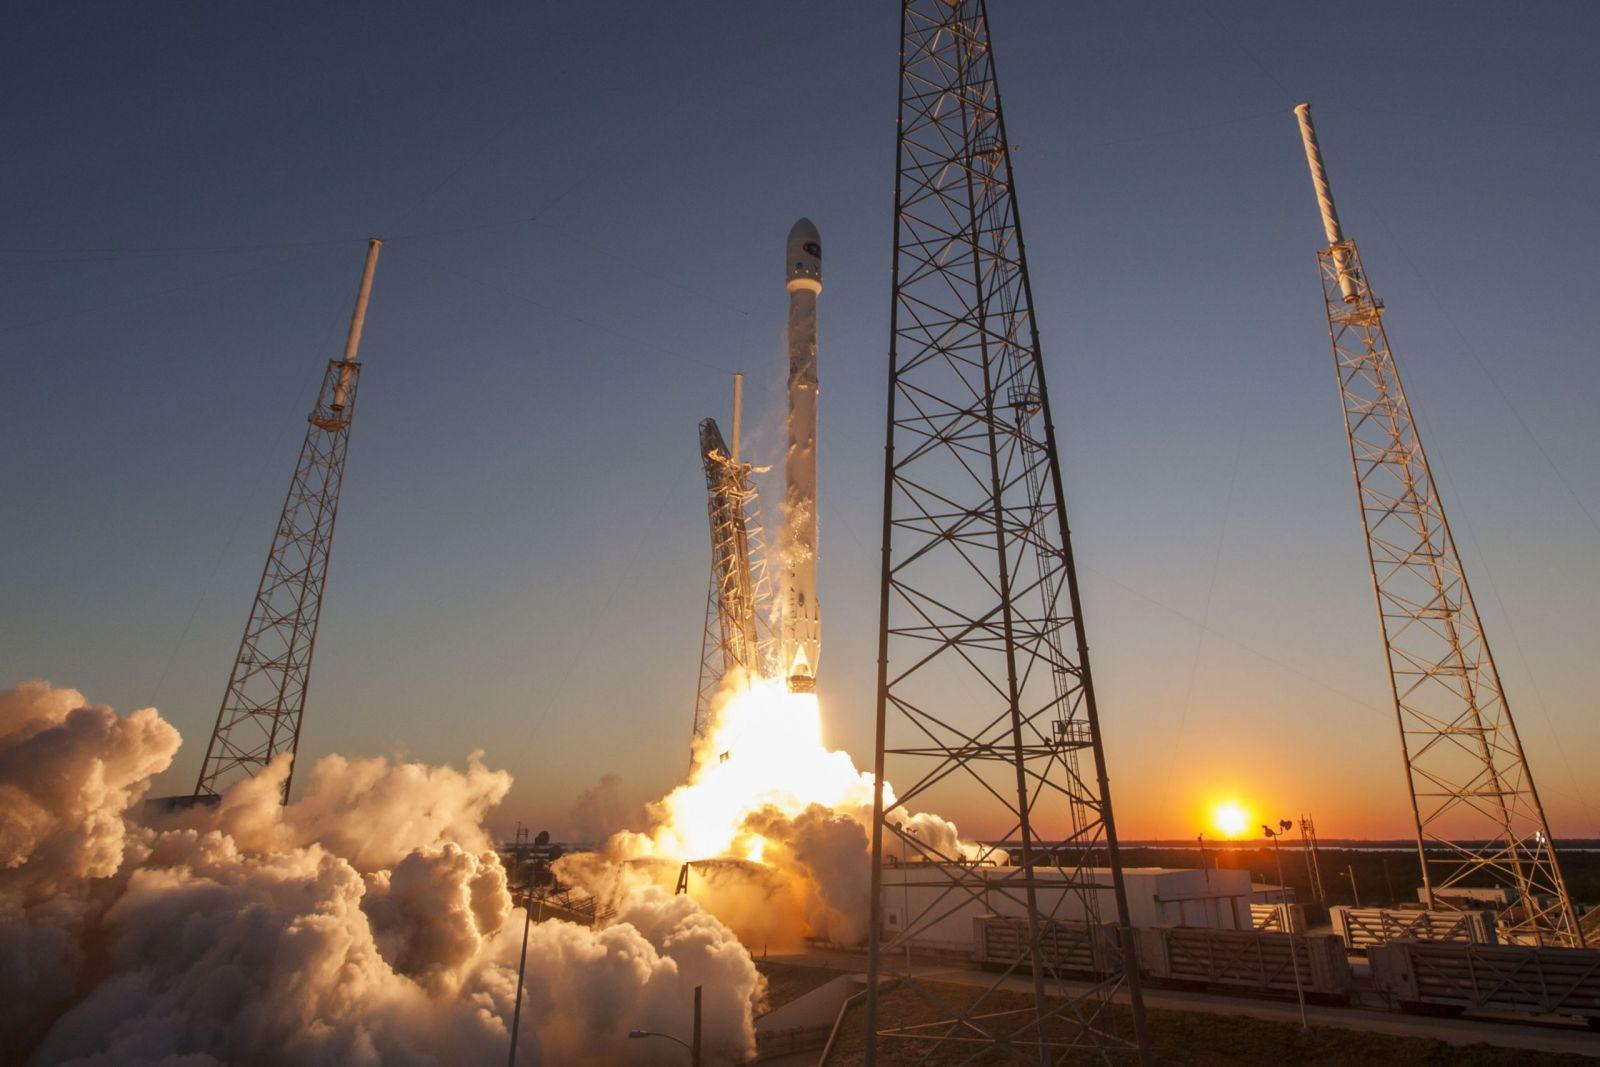 SpaceX рассказала о программной начинке ракеты Falcon 9 (f90deb12670e4bba9d9dad7bddb765bc 201707030122 scaled)